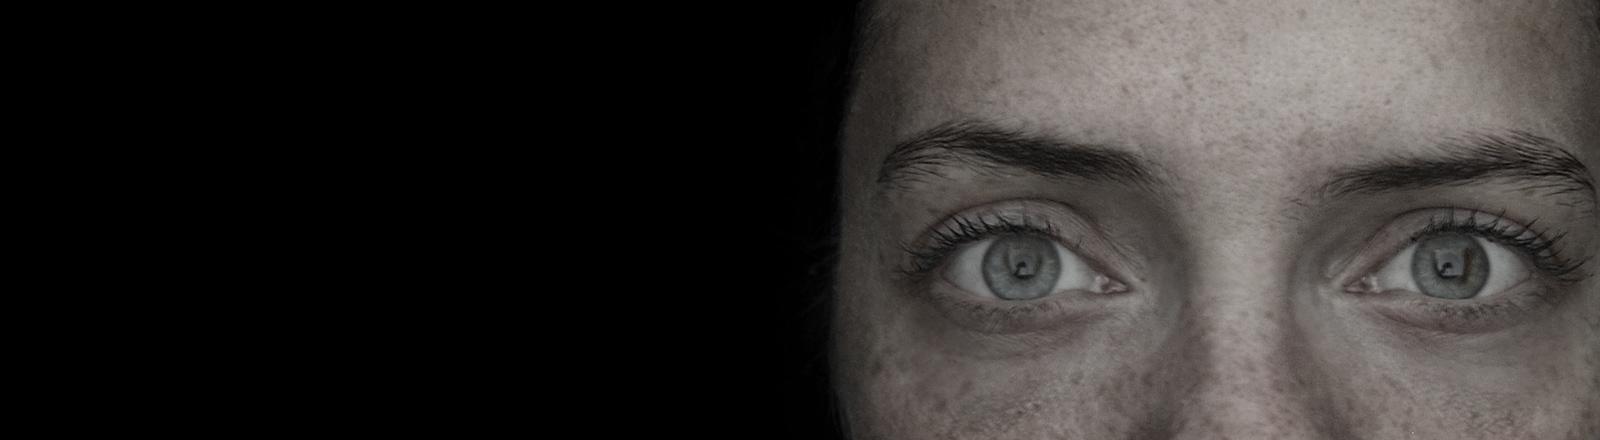 Nahaufnahme Augenpaar einer Frau